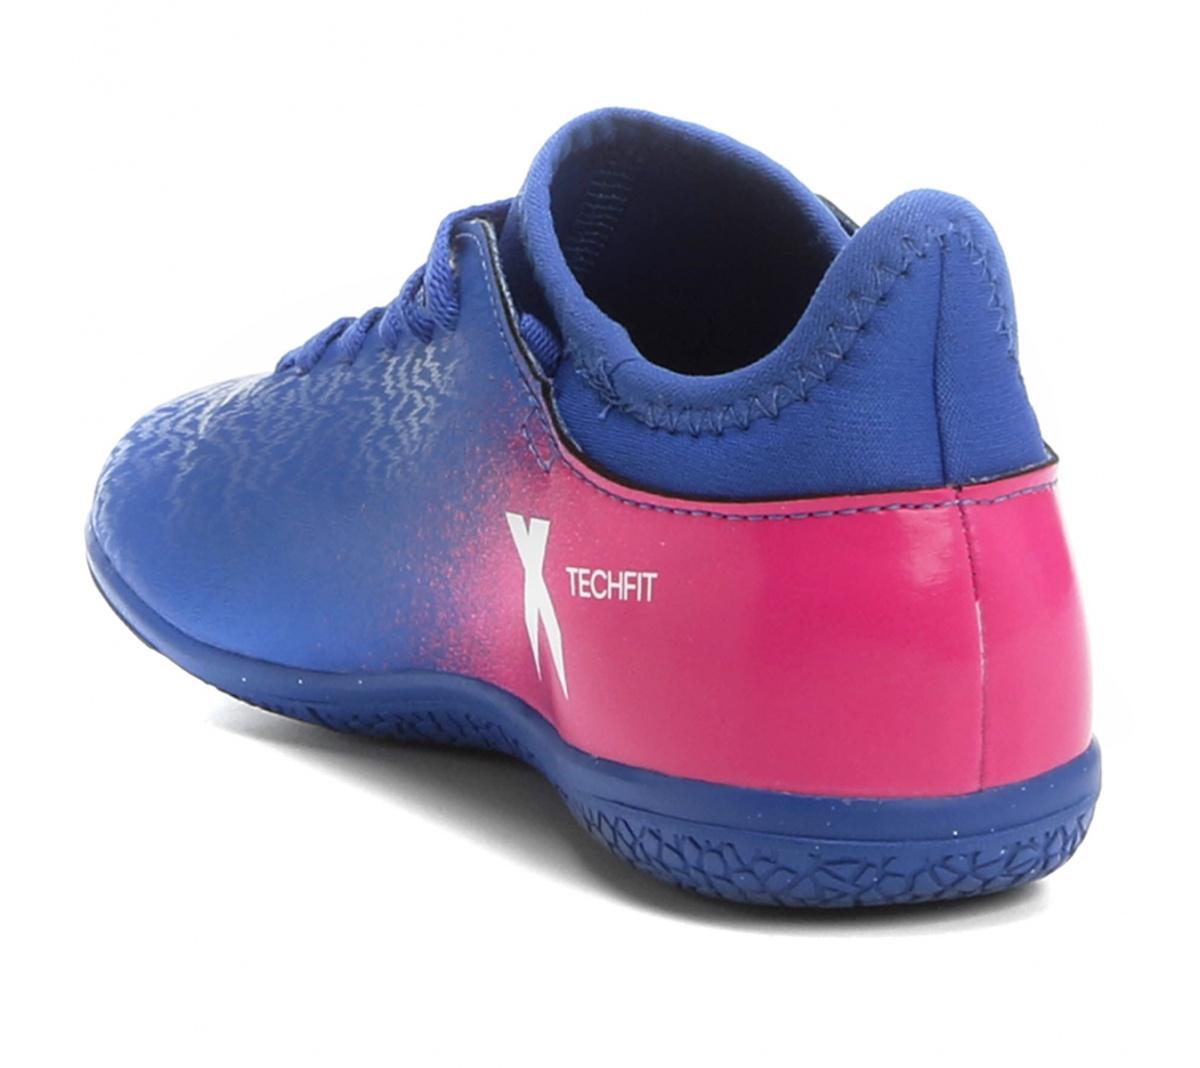 Tênis Adidas X 16.3 IN Infantil